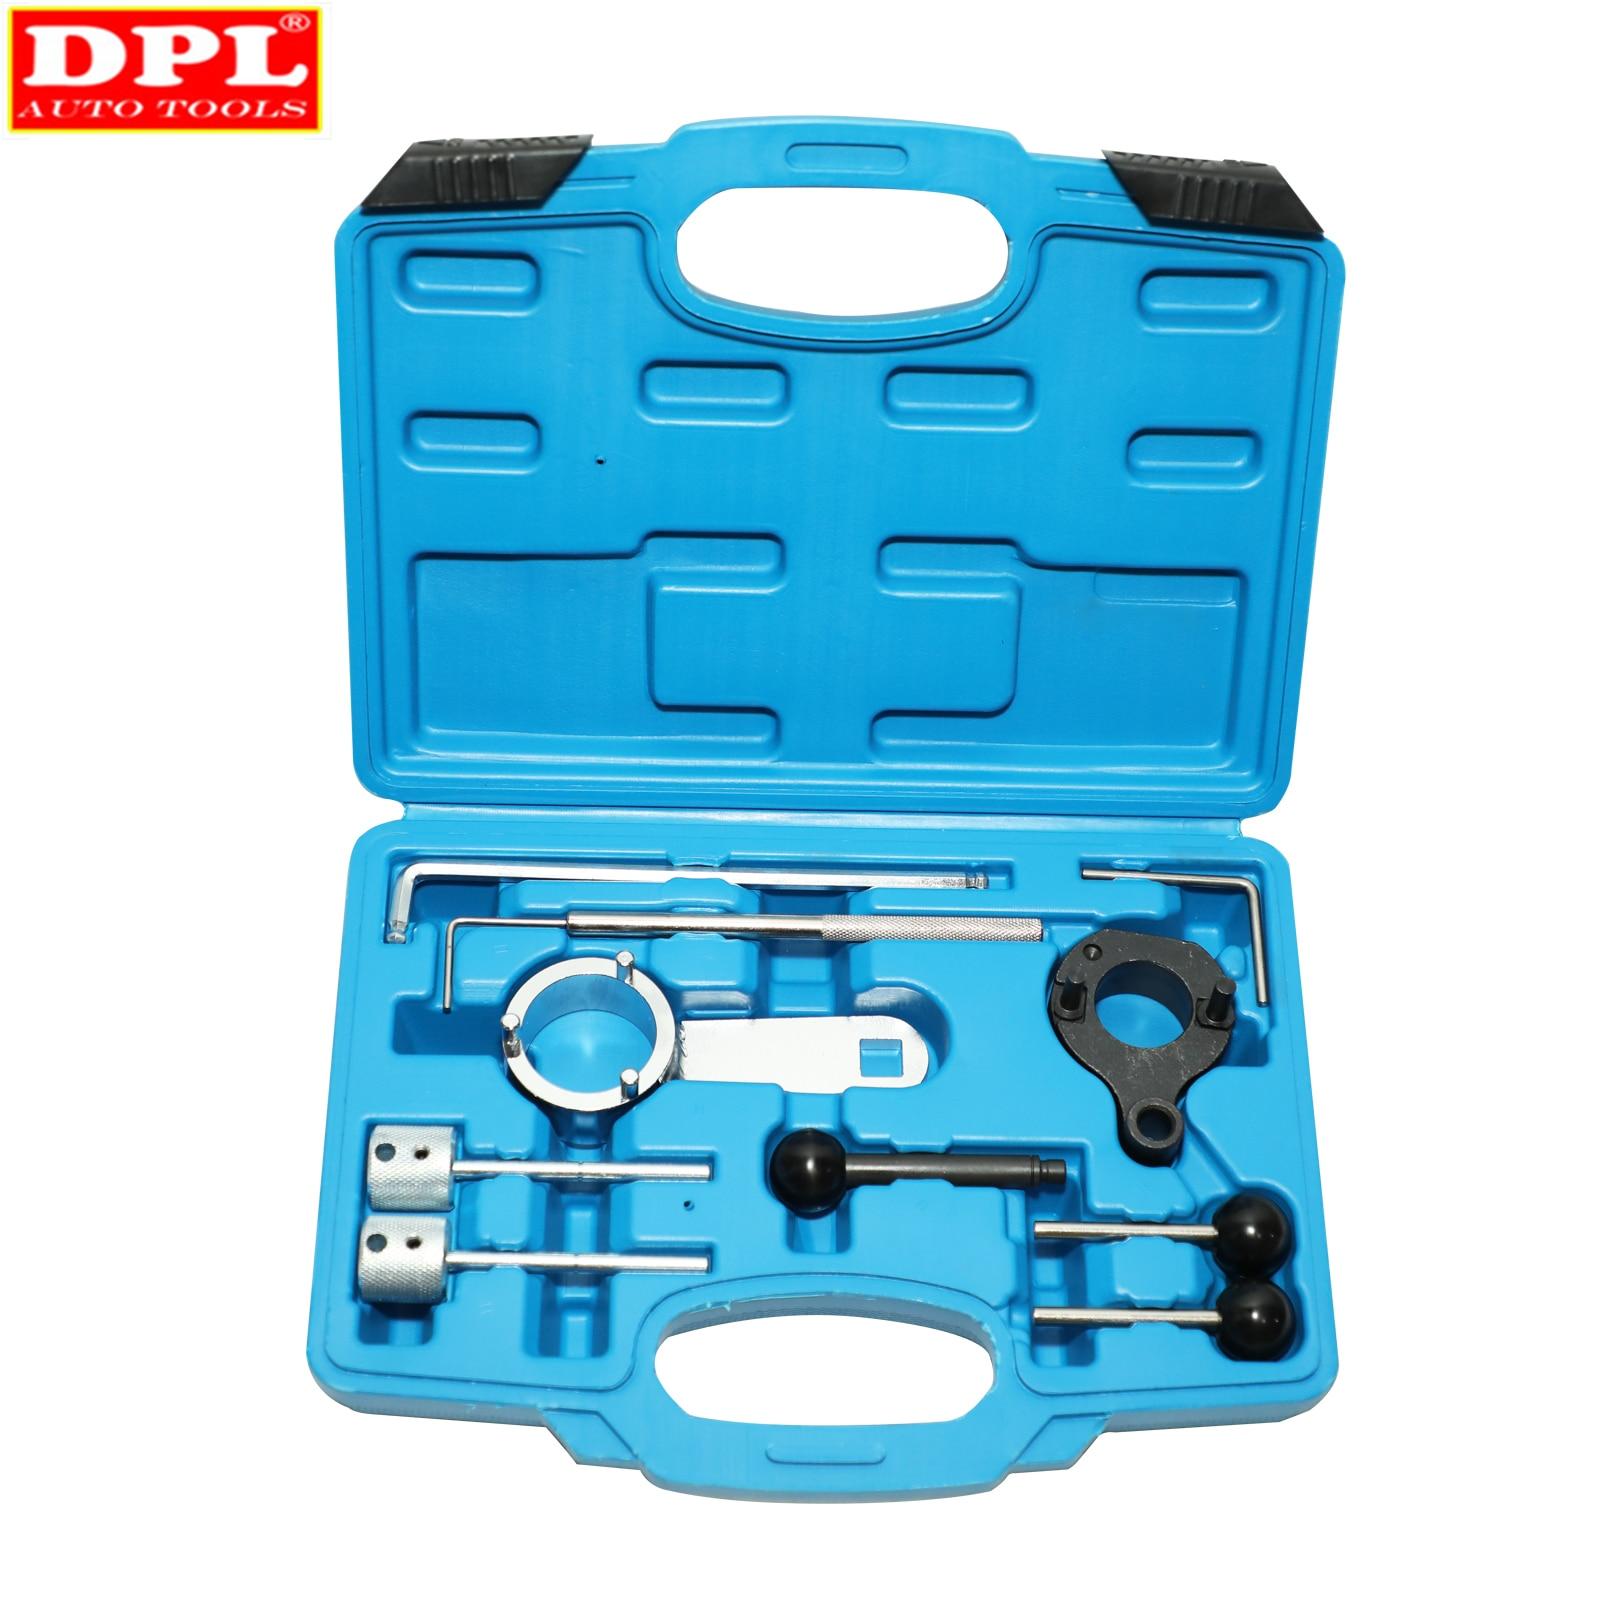 DIESEL ENGINE TIMING TOOL KIT FOR VW AUDI SEAT SKODA  1.6 2.0 TDI CR engine diesel injector puller set removal garage tool for vag tdi vw audi